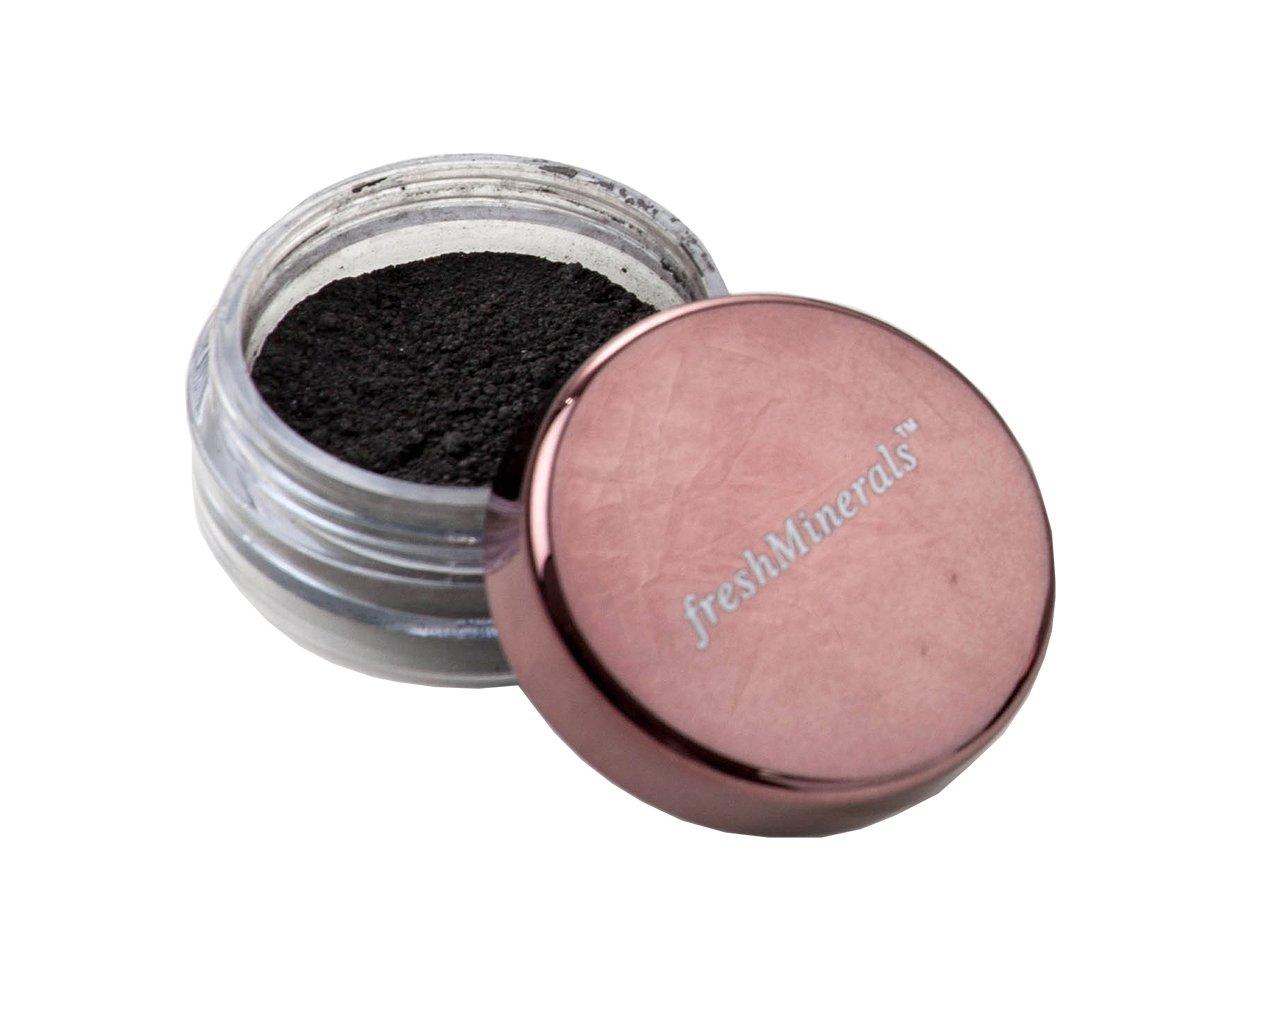 FreshMinerals Loose Eyeshadow, Imperial Gray, 1.5 Gram